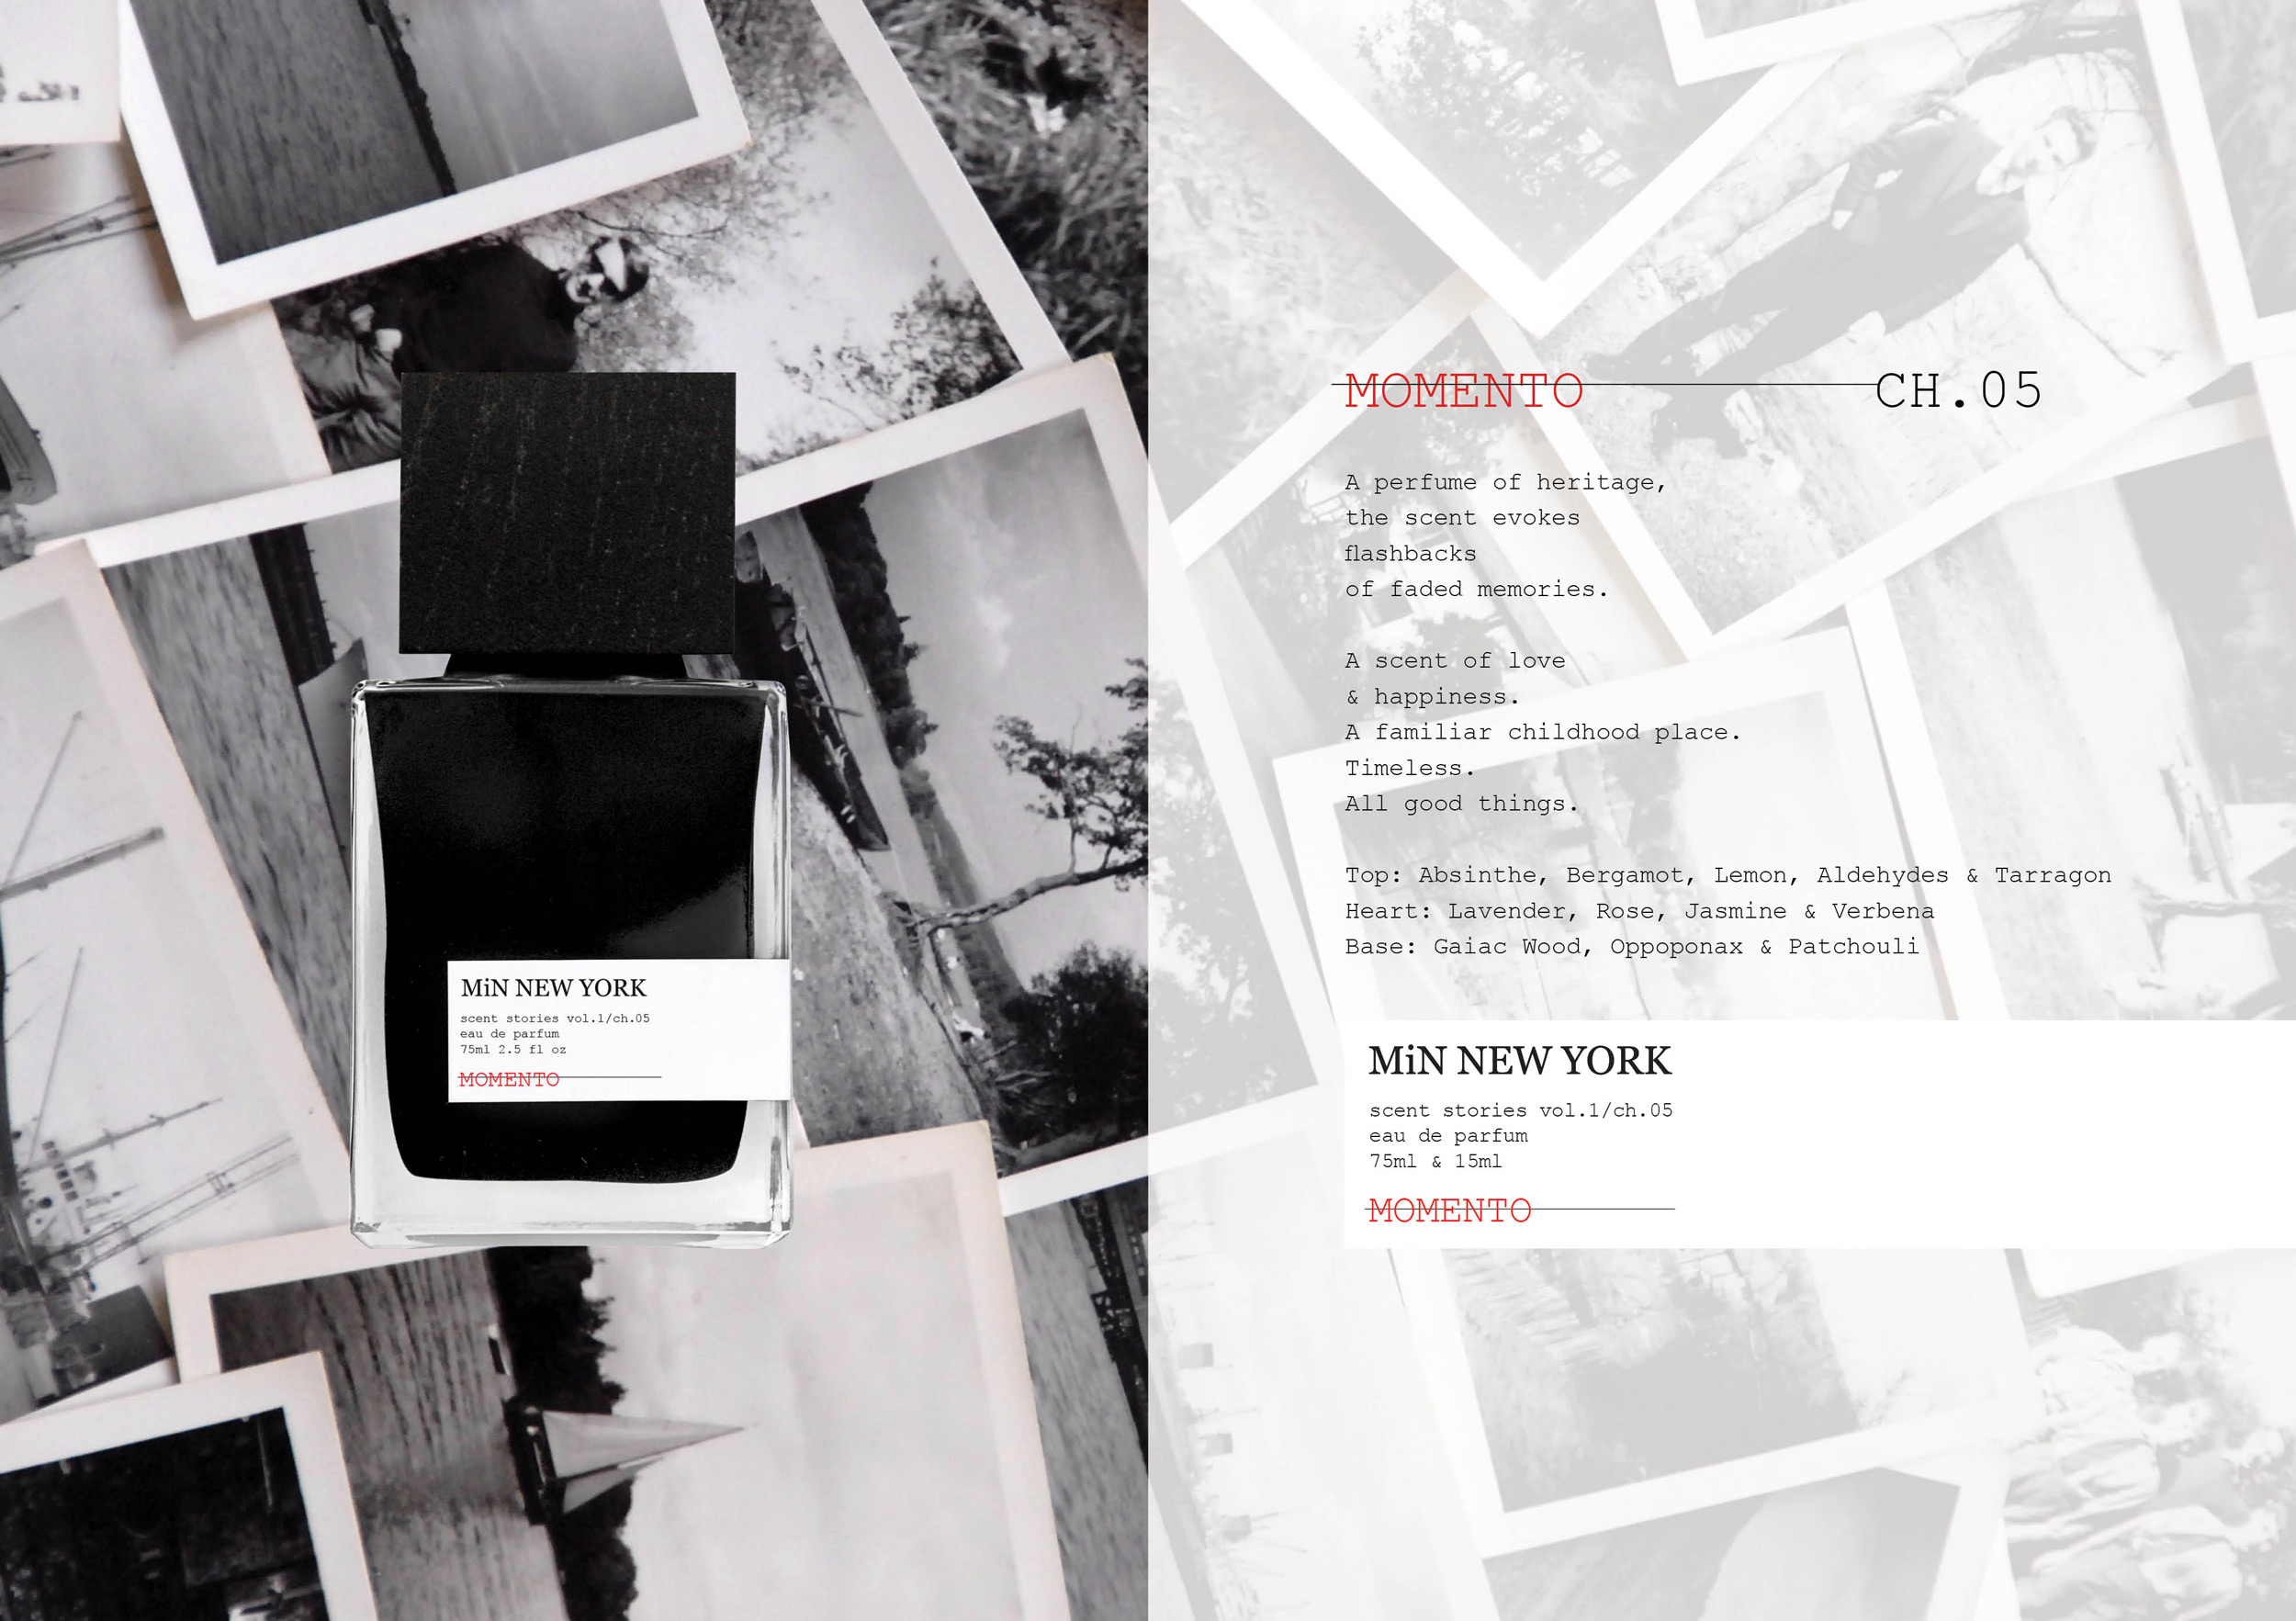 6e60c5876b36 Chad Murawczyk MiN New York Scent Stories Momento